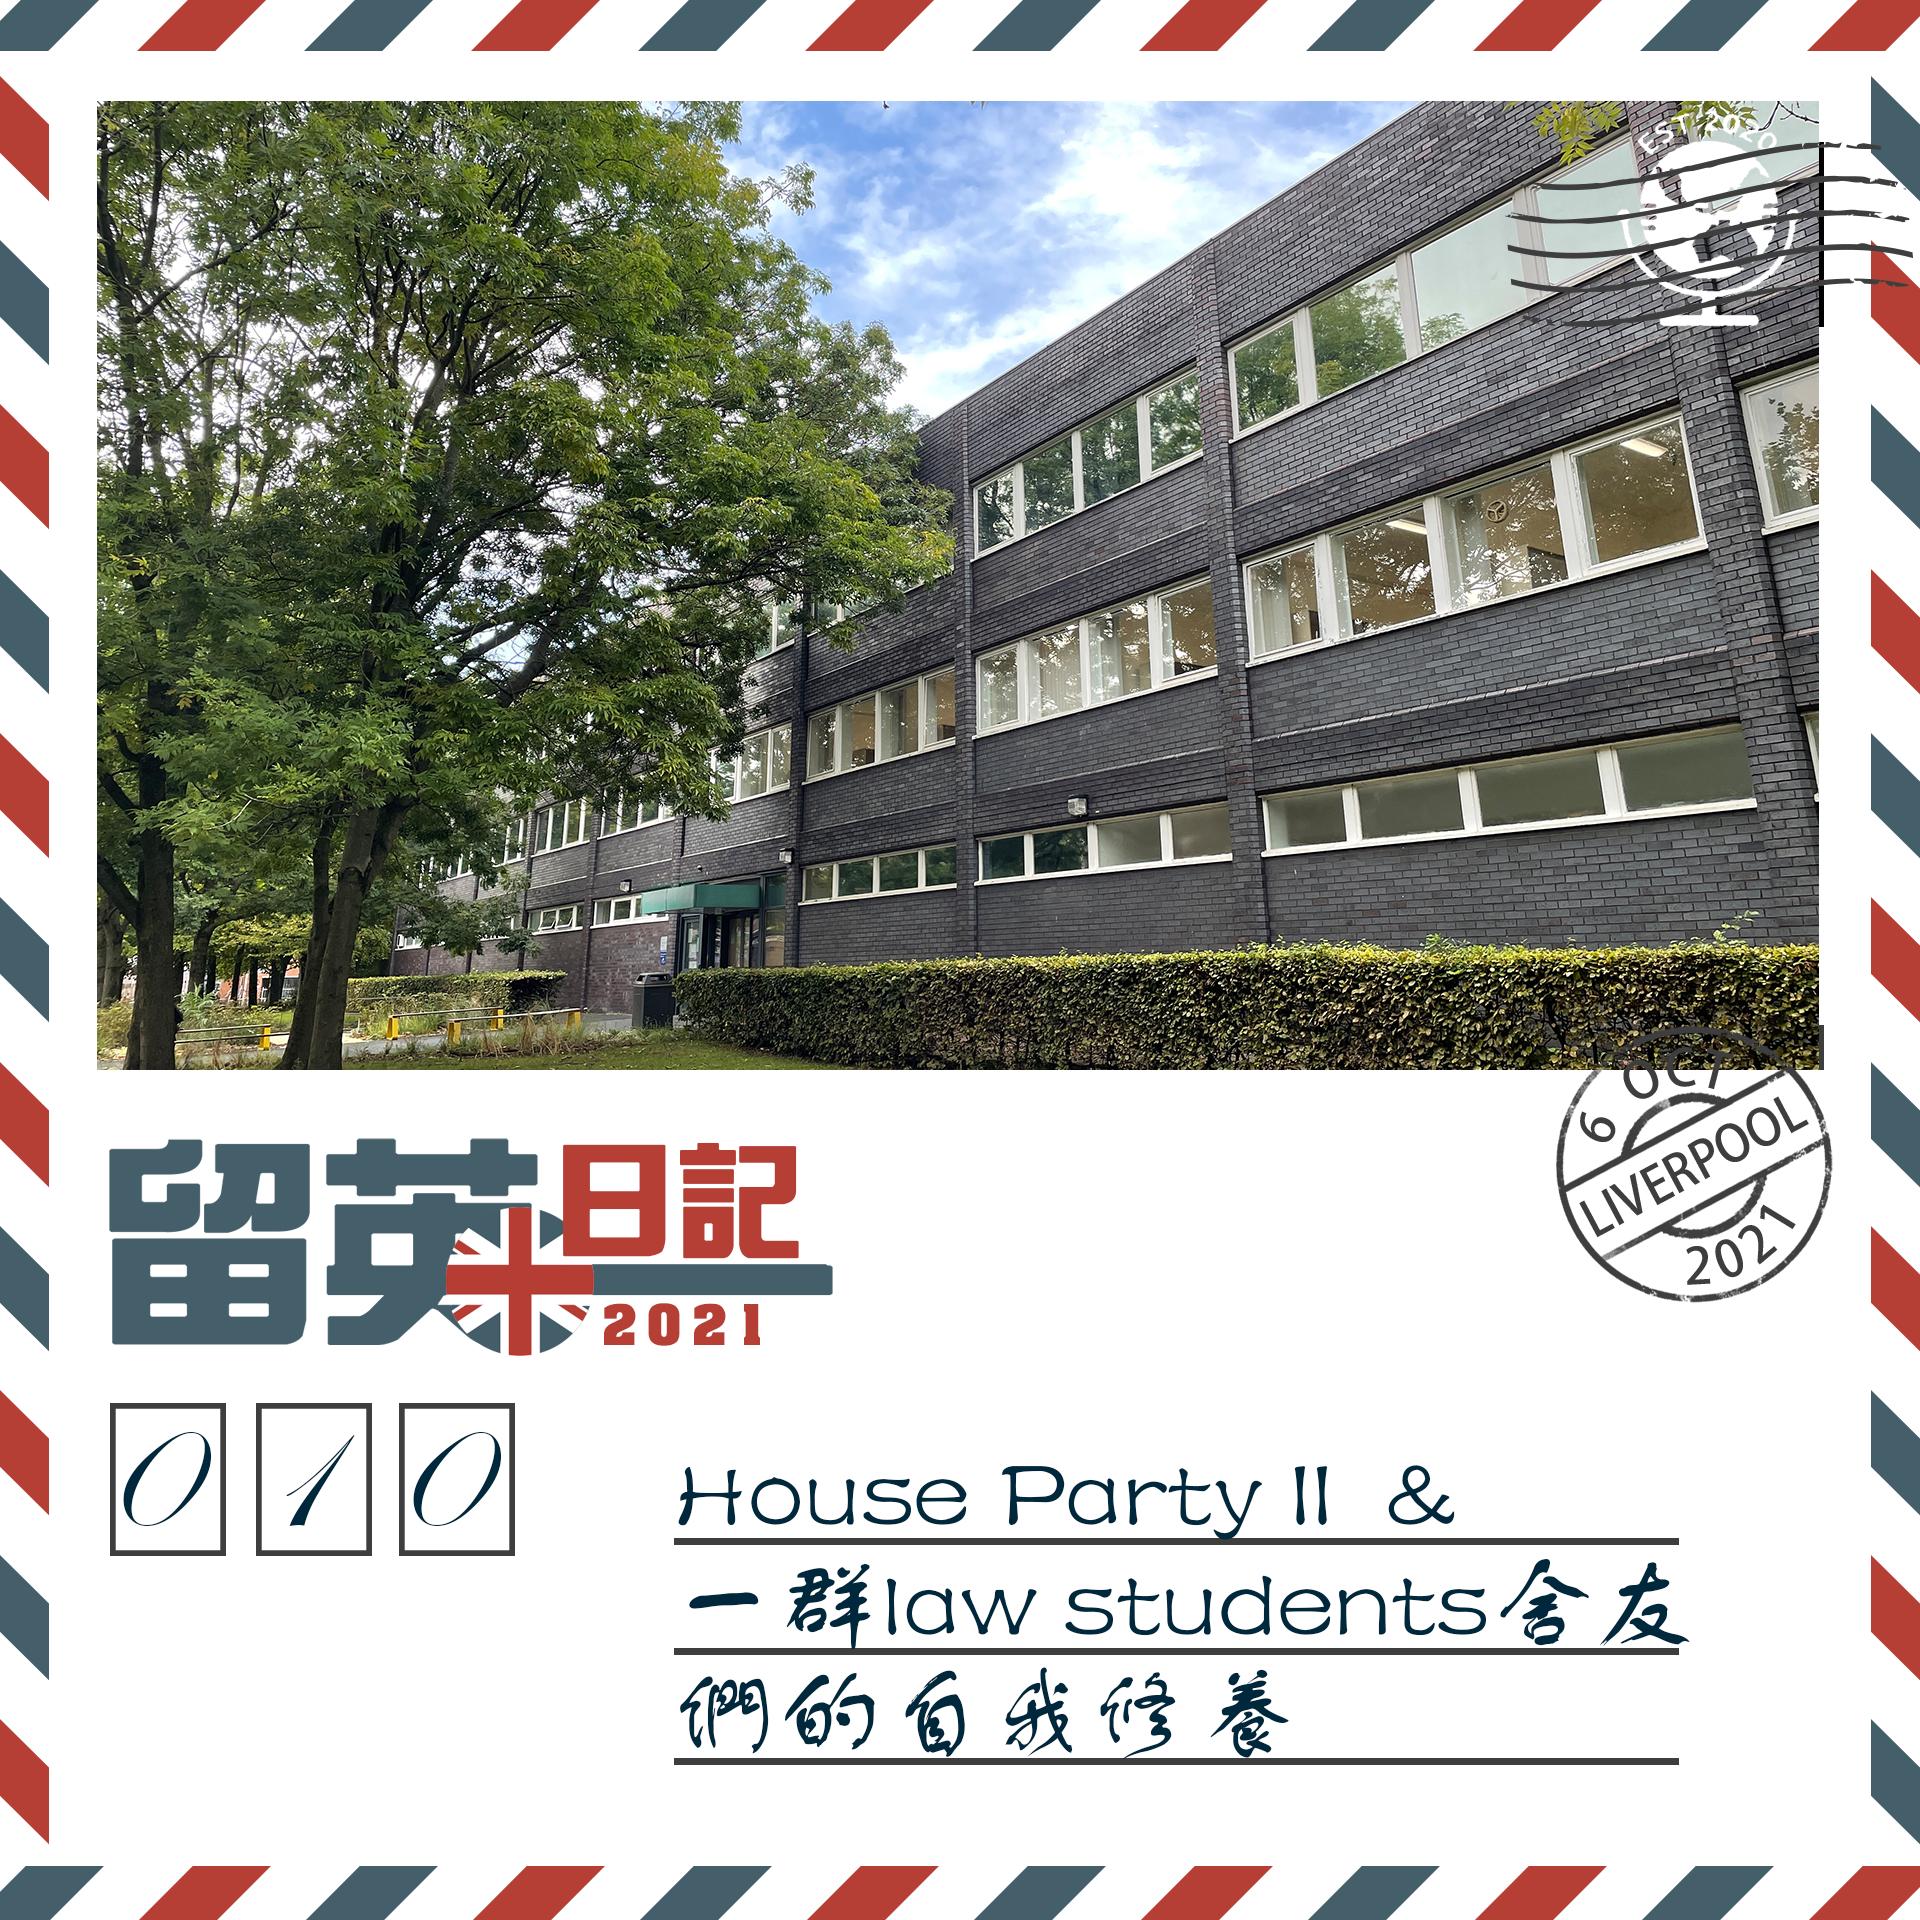 留英日記010 - House Party II & 一群law students舍友的自我修養